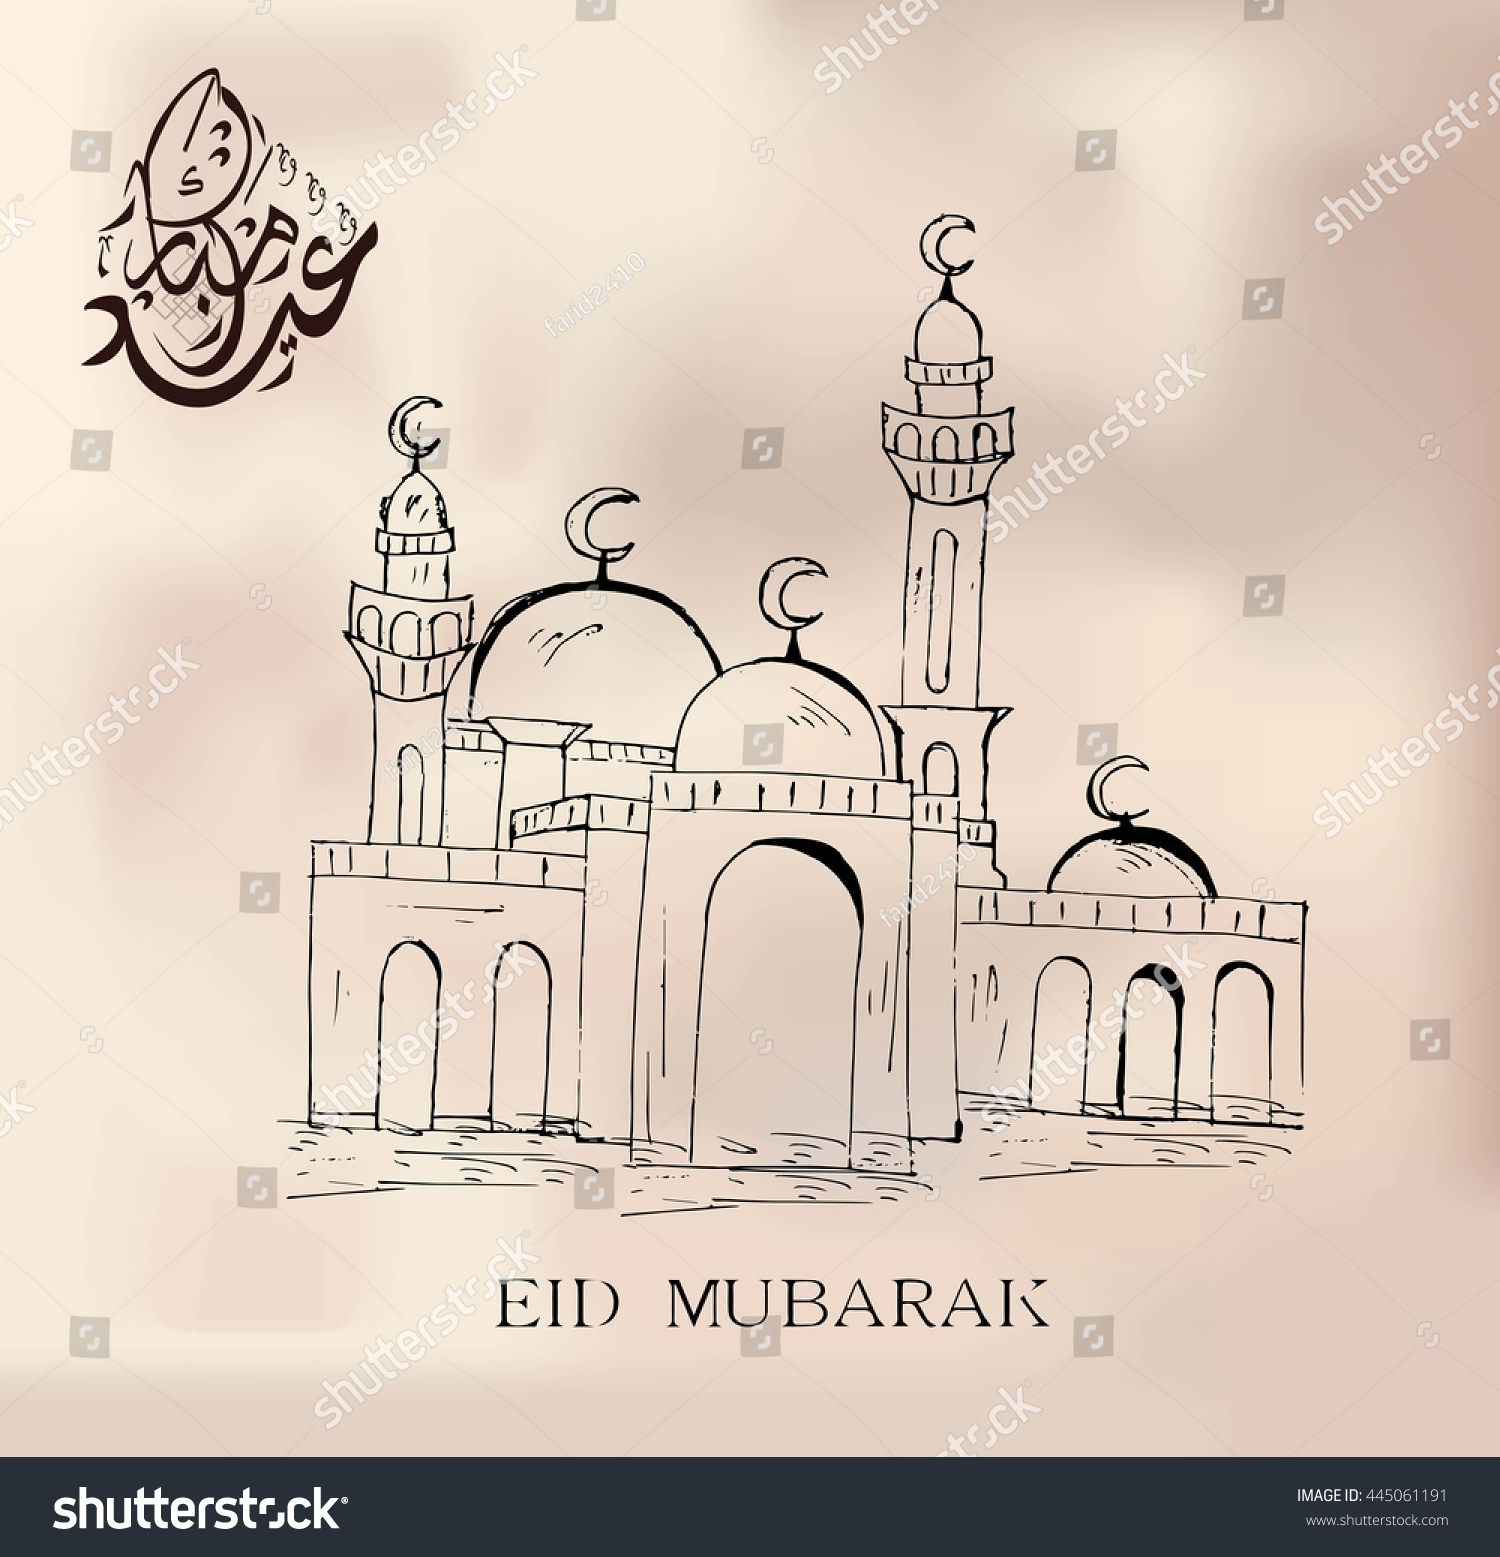 Eid Mubarak Watercolor Mosque Sketch For Eid Mubarak Greeting